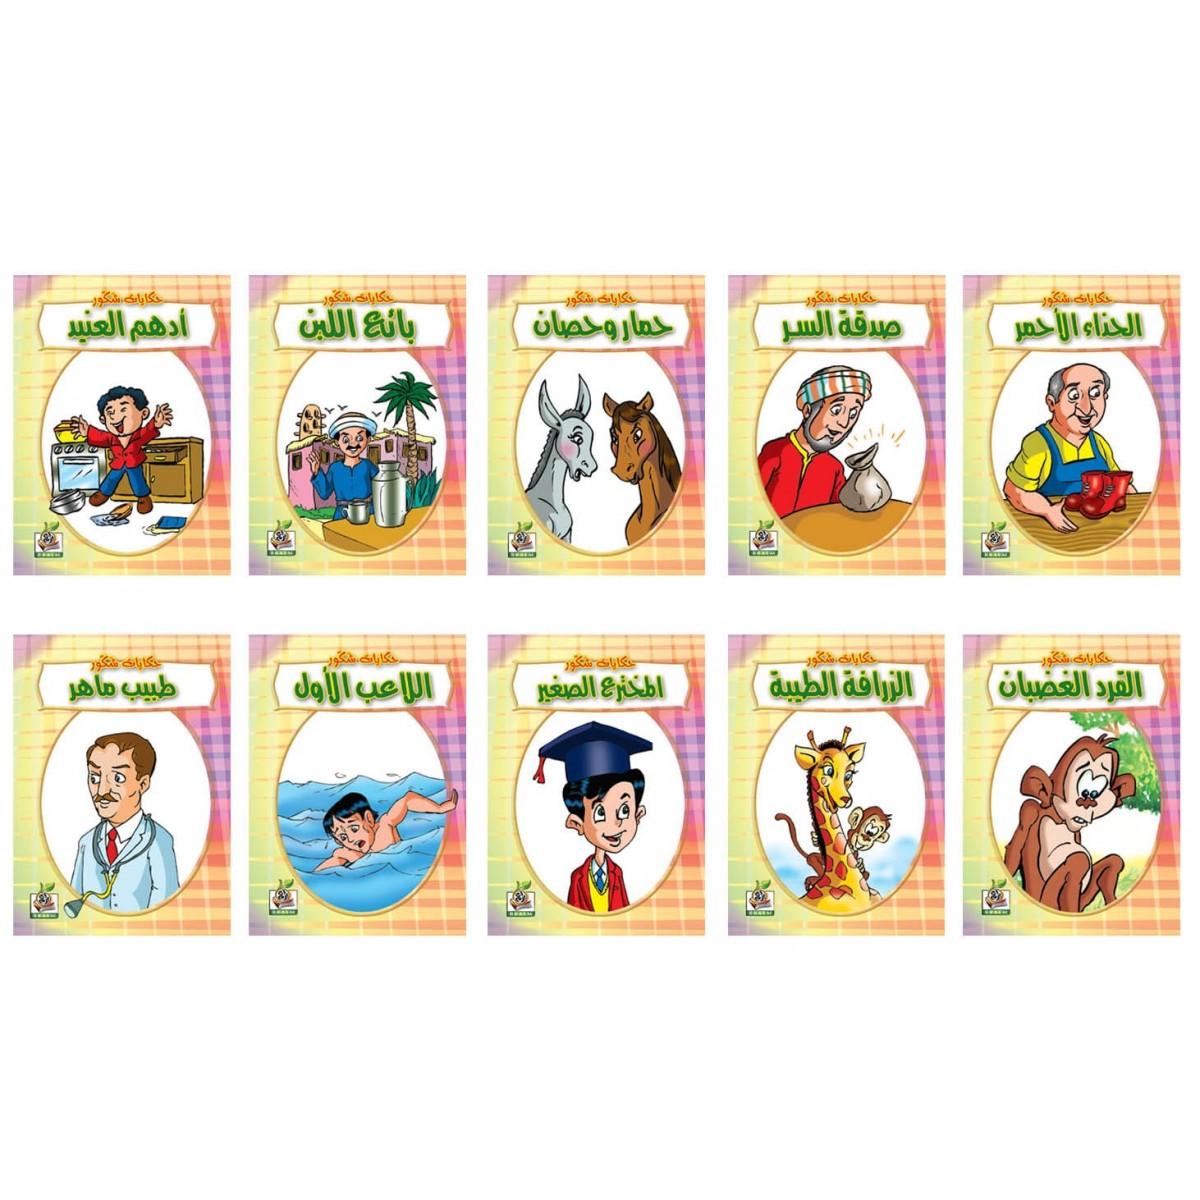 حكايات شكور عدد 10 كتب